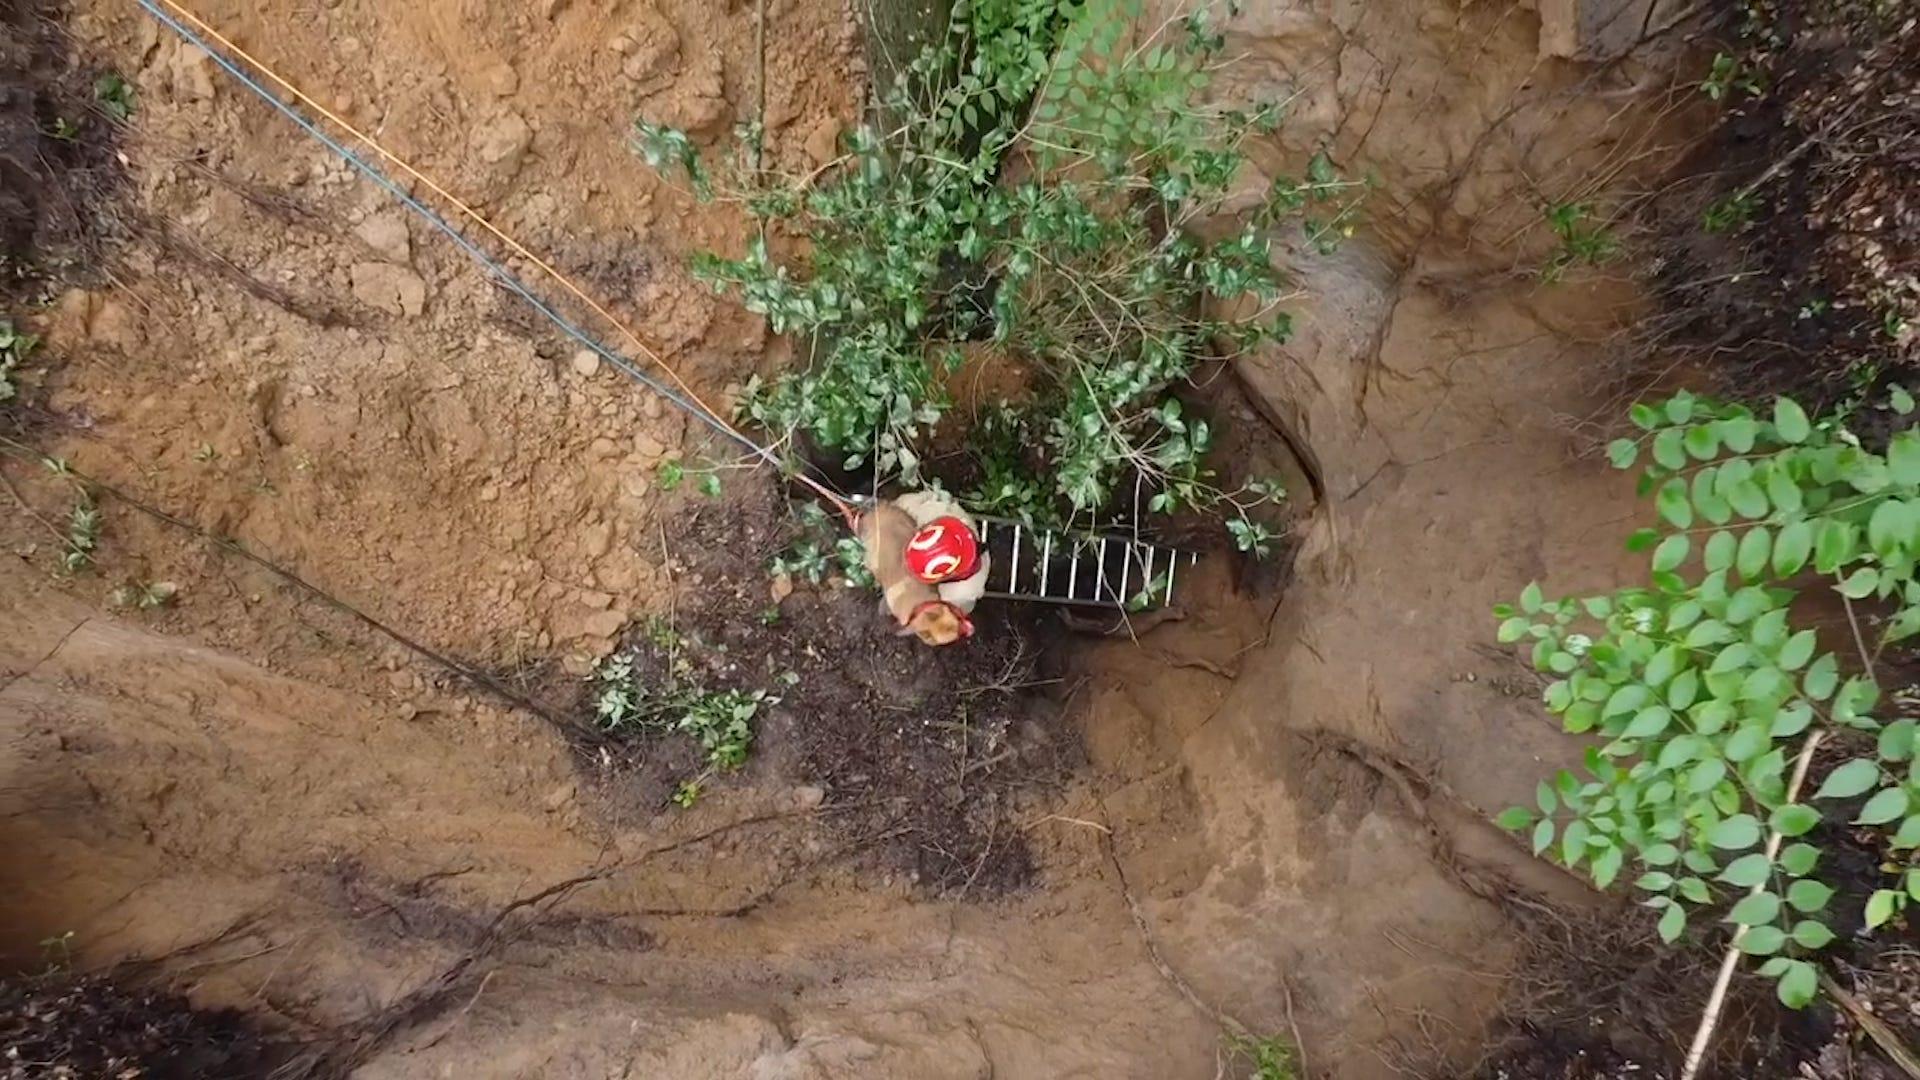 Golden retriever is rescued from 40-foot sinkhole